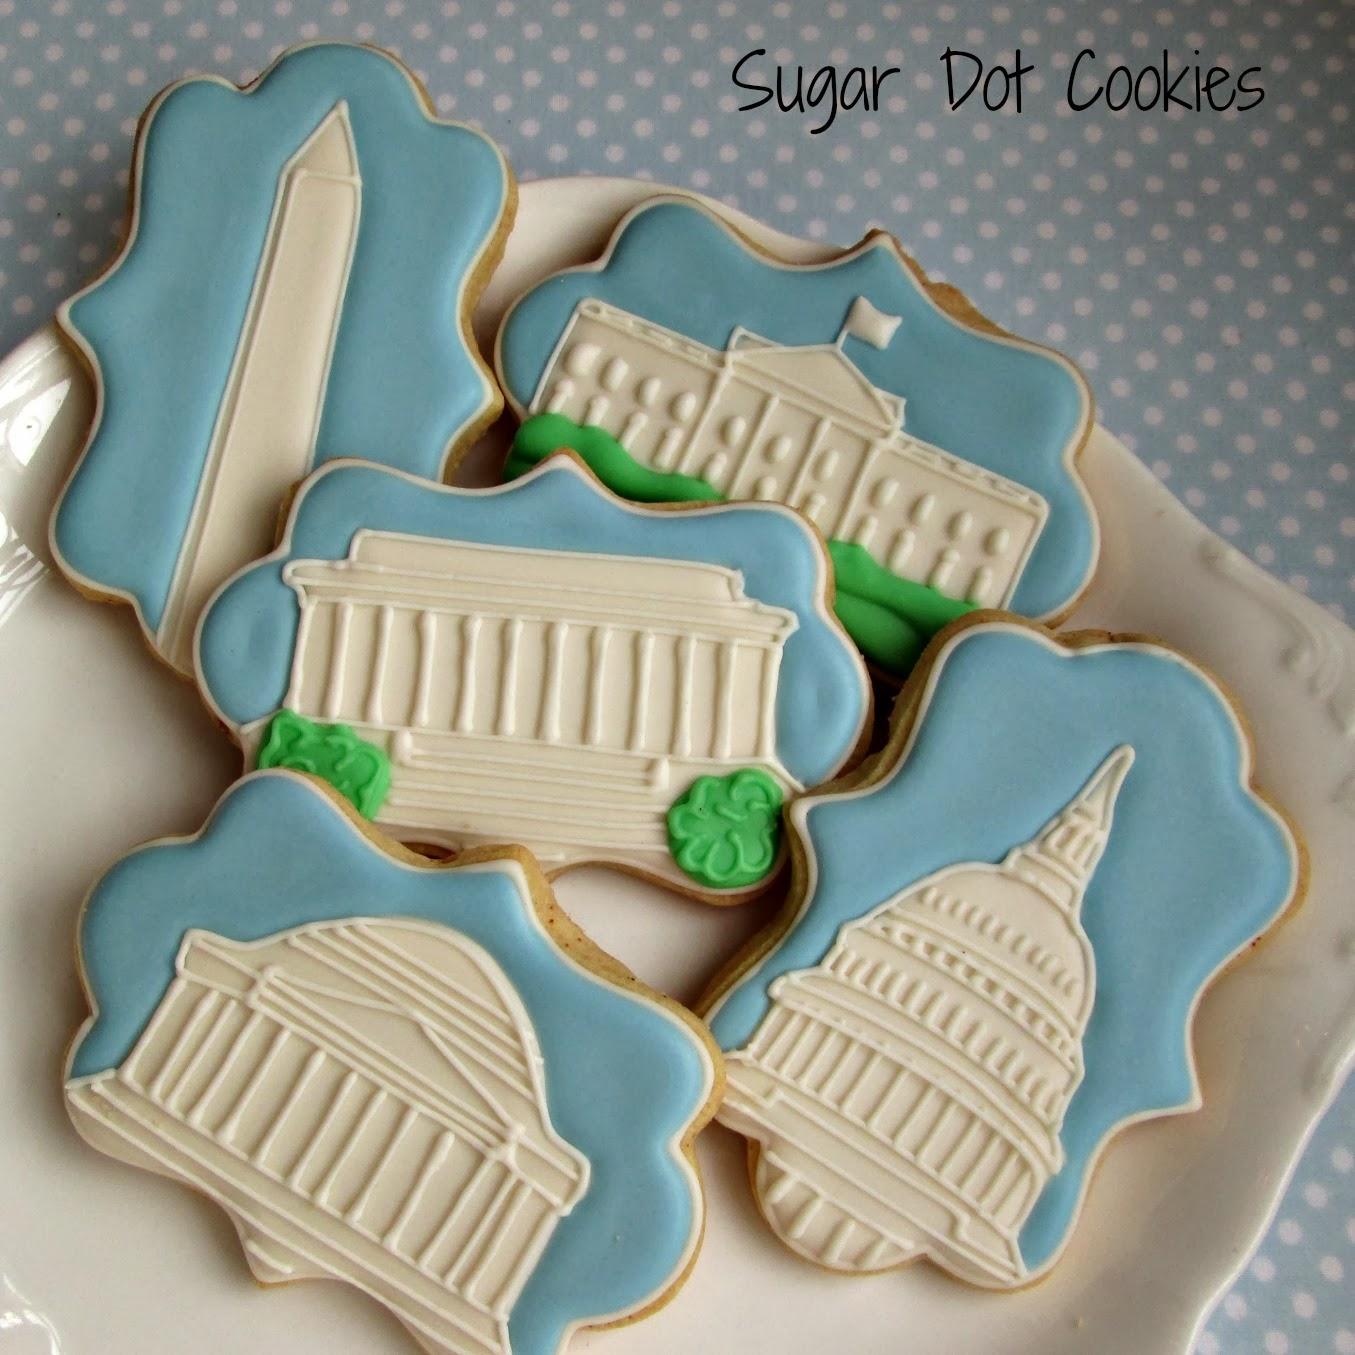 https://1.bp.blogspot.com/-lg4hj6oIyLs/Uv2DNKx1xFI/AAAAAAAALbk/uFFBHwKqYD4/s1600/sugar+cookies+decorated+custom+royal+icing+frederick+md+maryland+washington+monument+jefferson+lincoln+white+house+capitol+capital+washington+dc+2.jpg